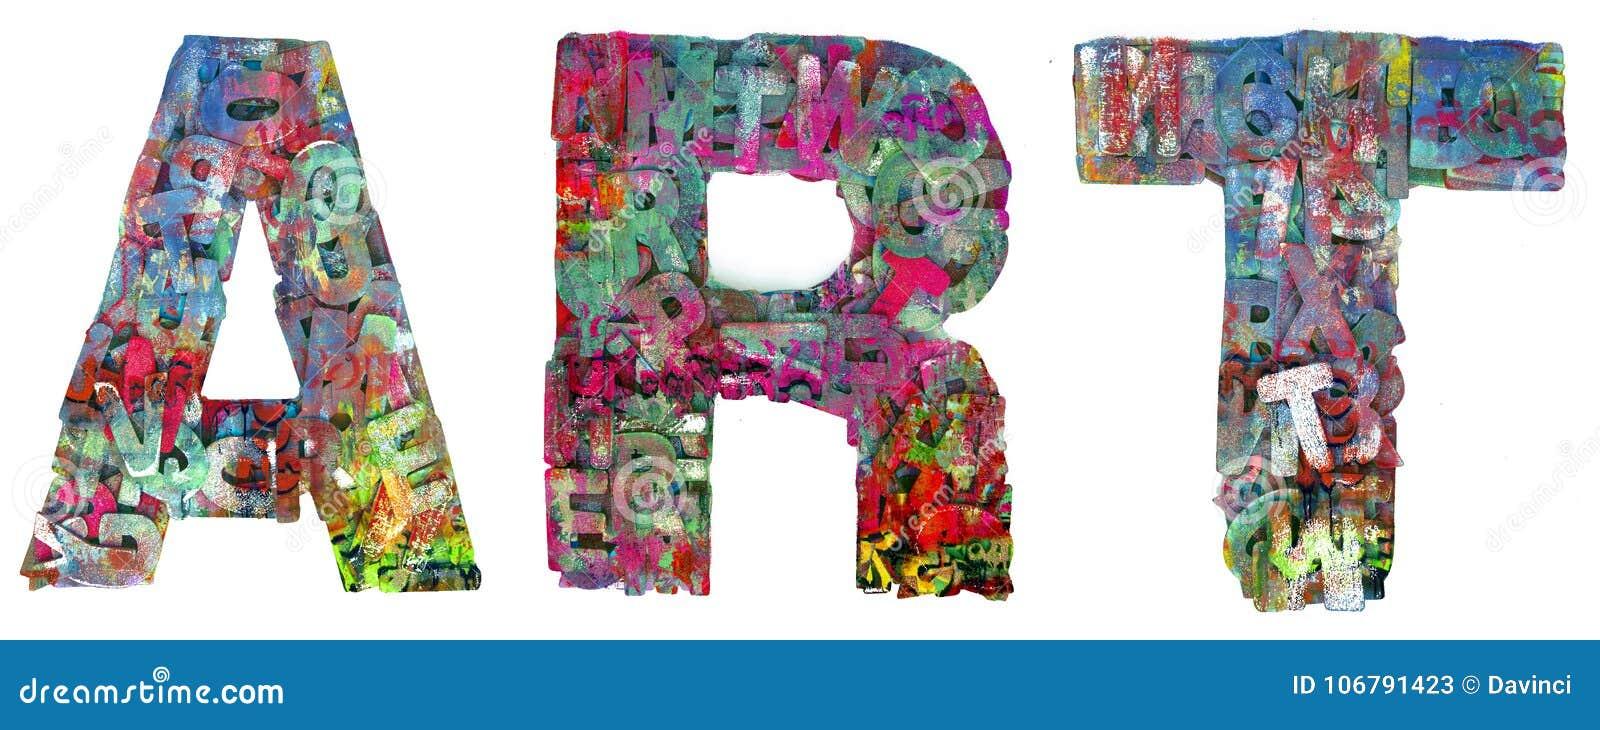 Graffiti word ART isolated stock image. Image of artwork